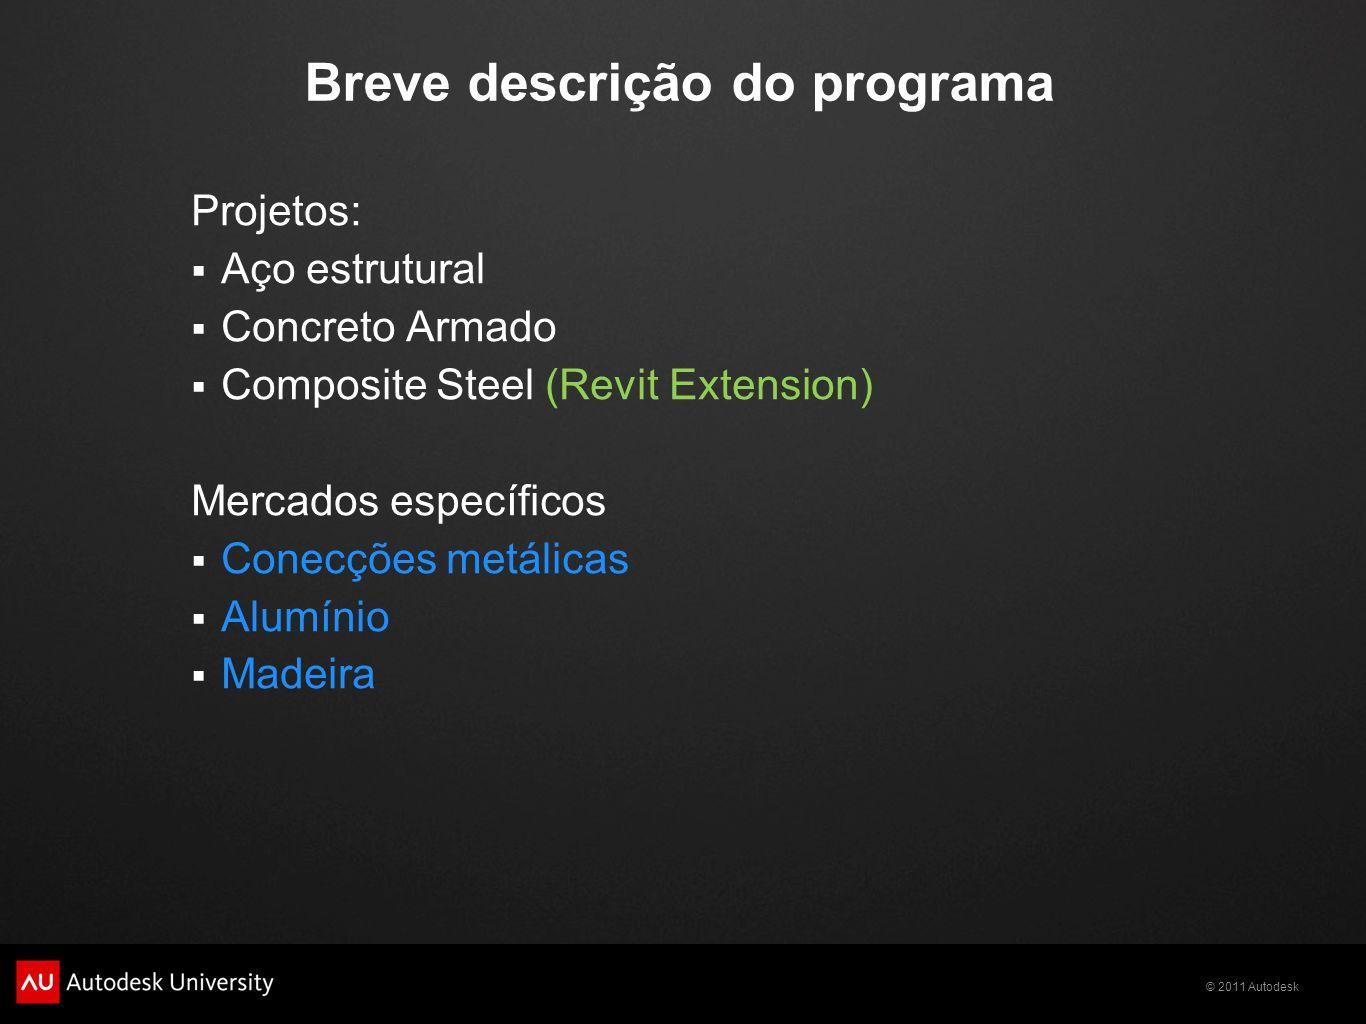 © 2011 Autodesk Breve descrição do programa Interoperabilidade: Robot Structural Analysis Professional API Revit Structure AutoCAD Structural Detailing InventorExcel 3 rd Party Applications Open & Save As DWG, DXF, IFC, CIS/2, Staad, Sap 2000